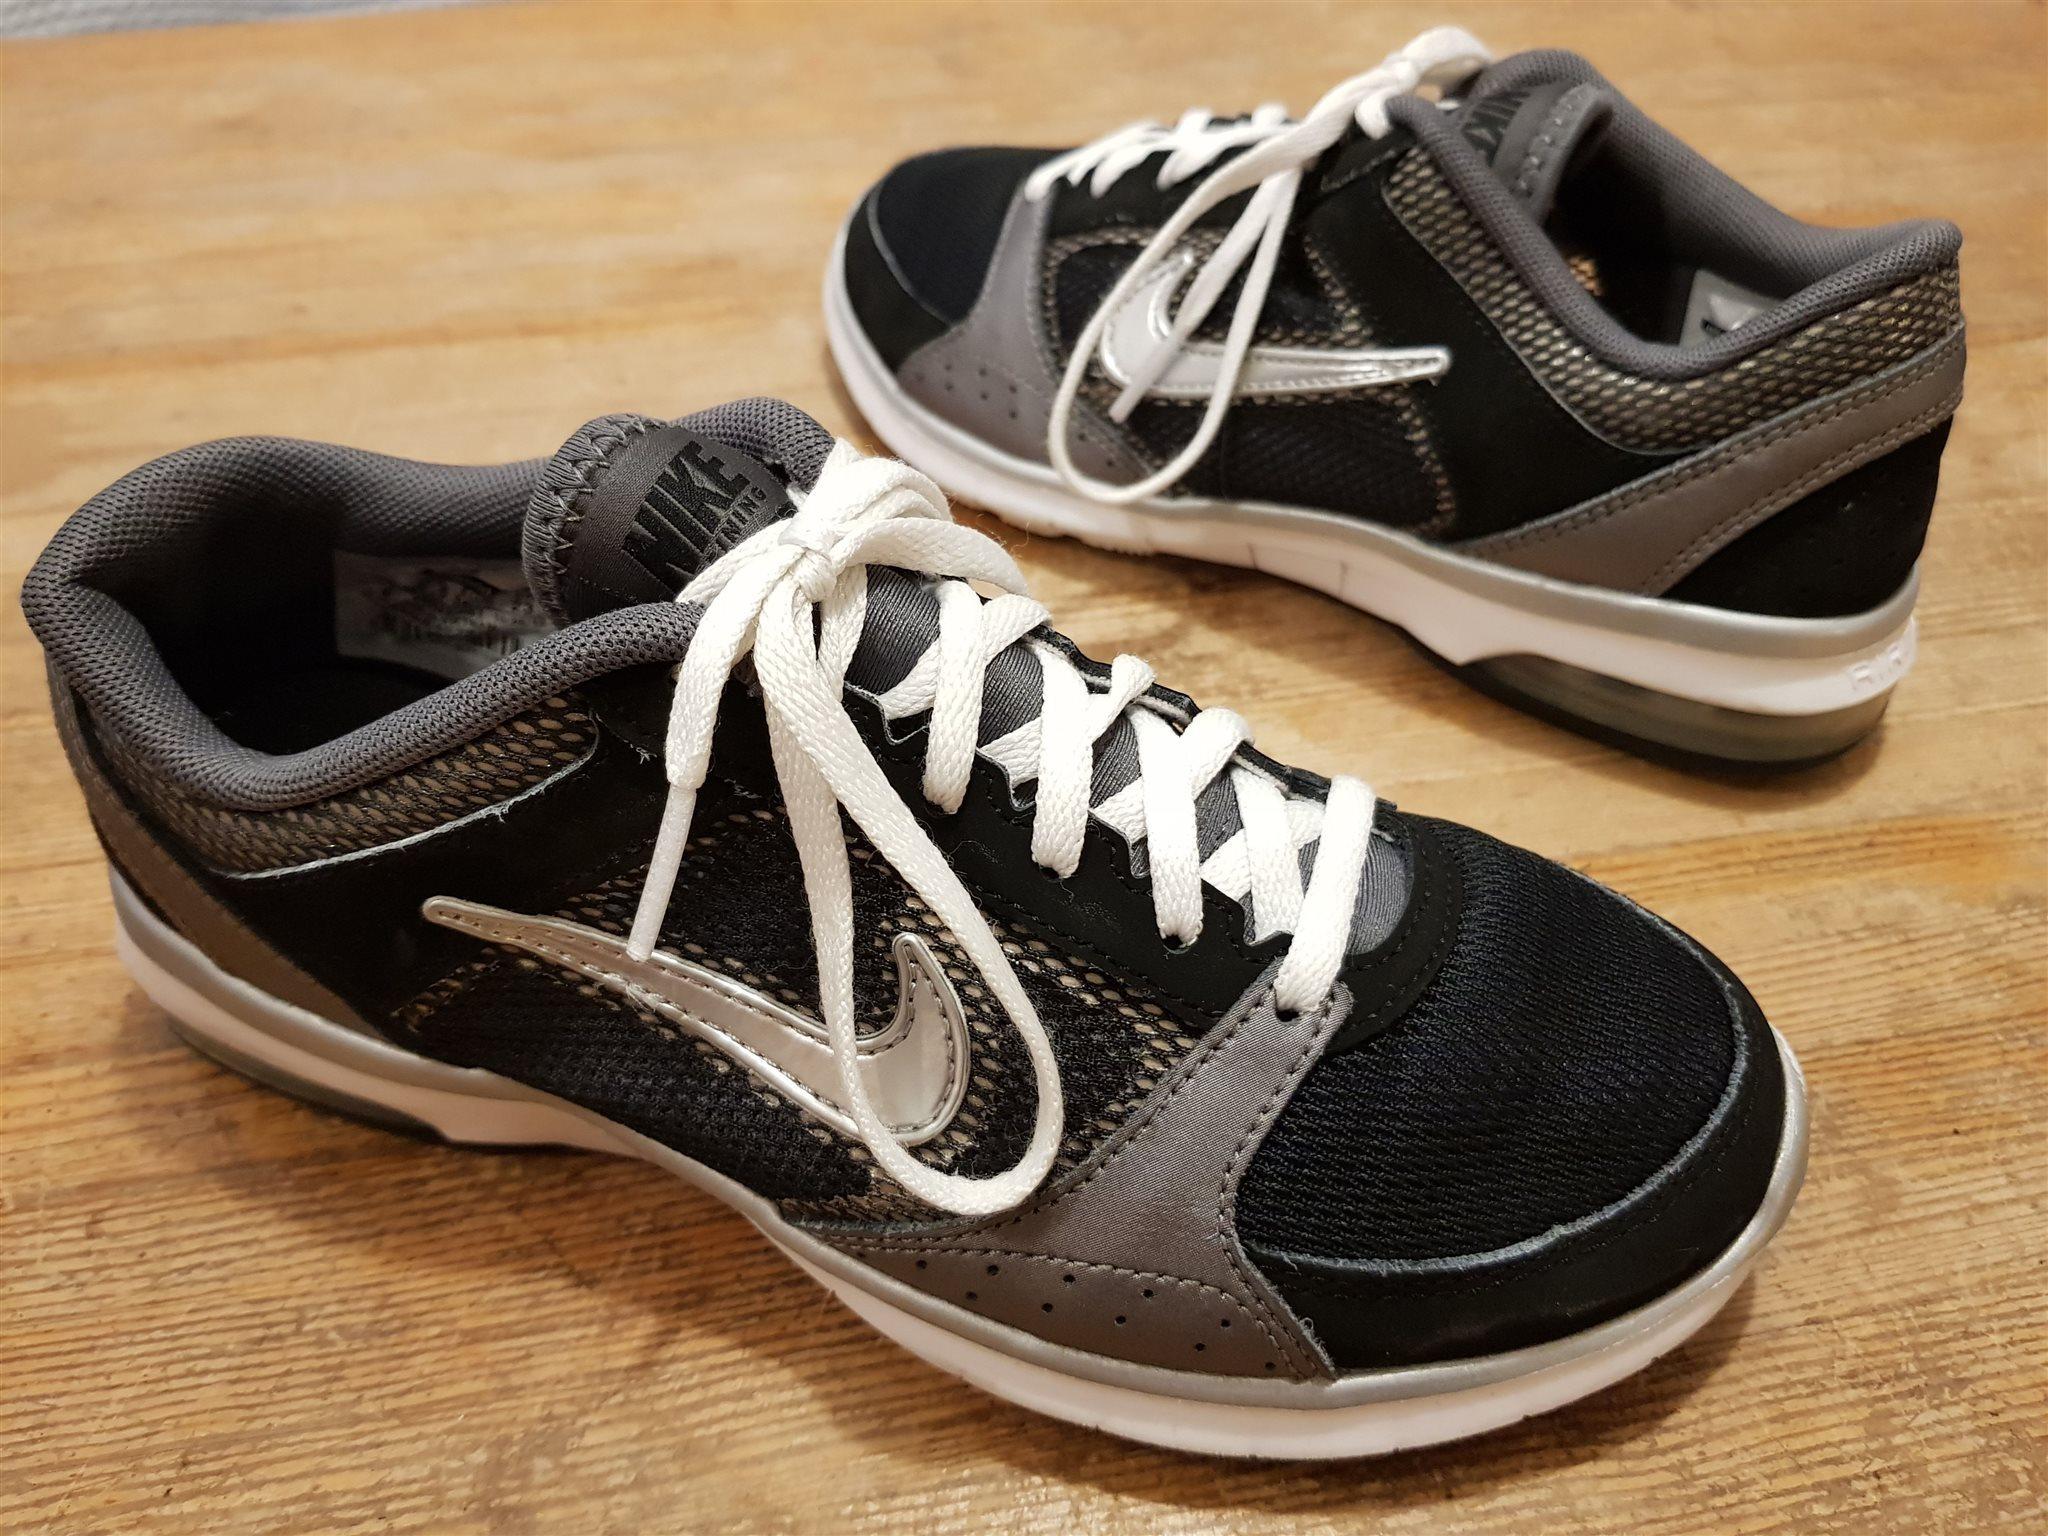 newest collection 12dbc 5c802 Löparskor sportskor Nike Air Max Fit Training sneakers str 36,5 i fint skick